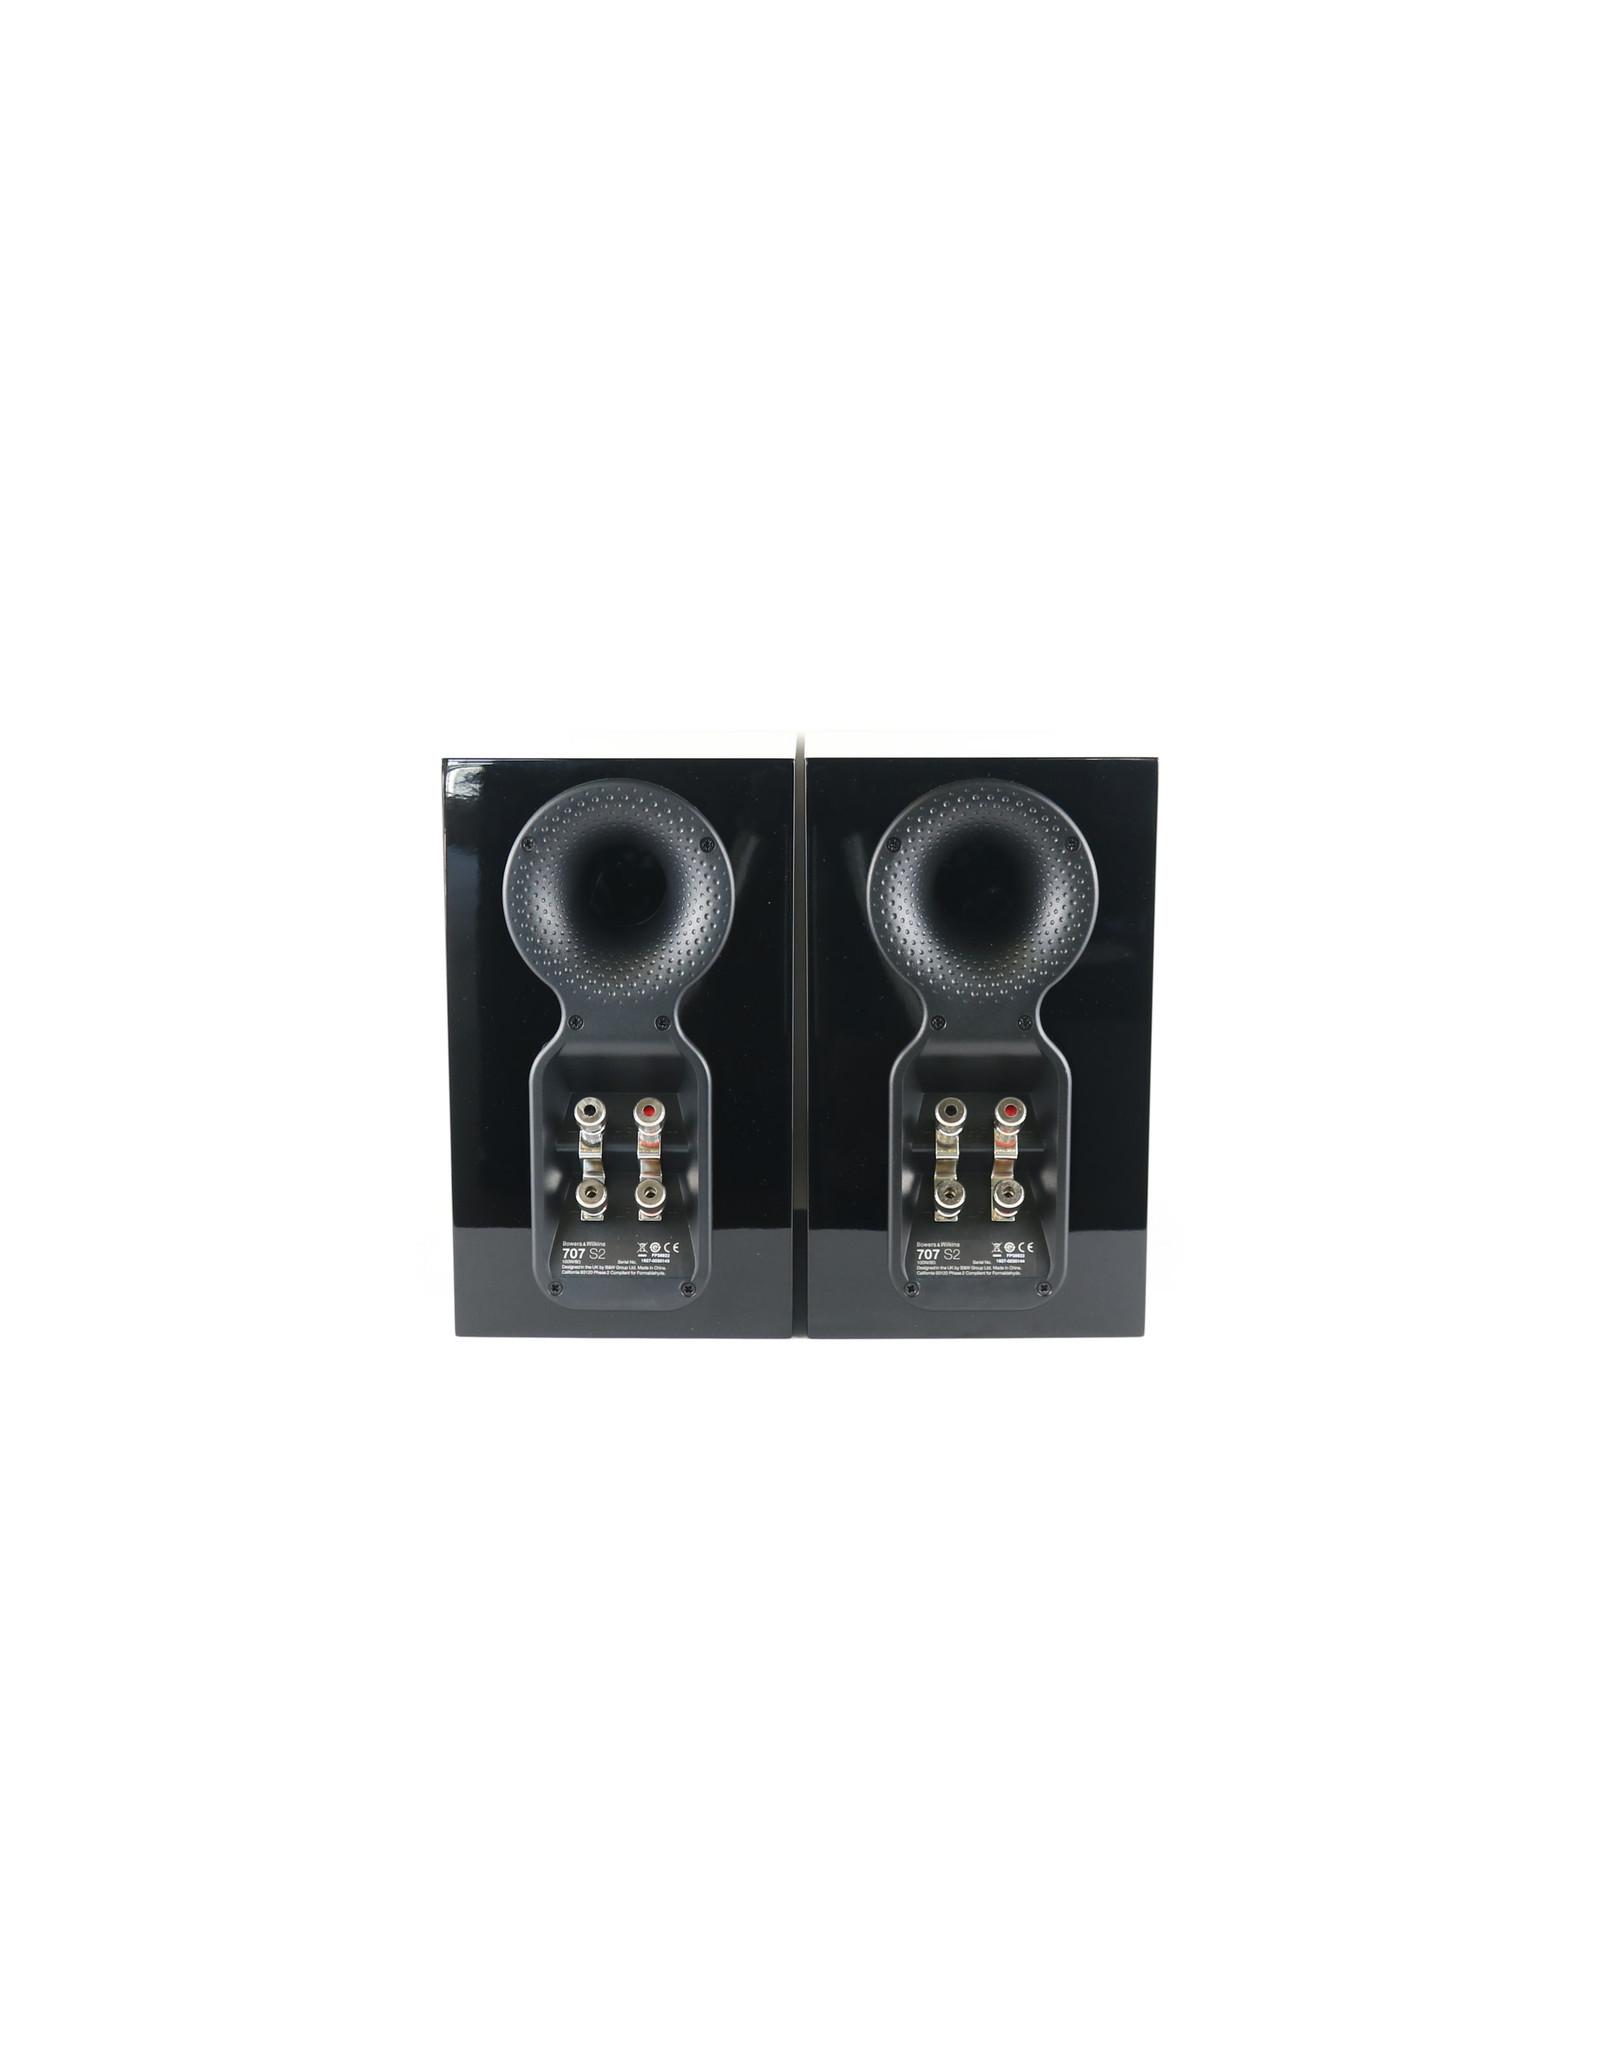 B&W B&W 707 S2 Bookshelf Speakers Gloss Black USED